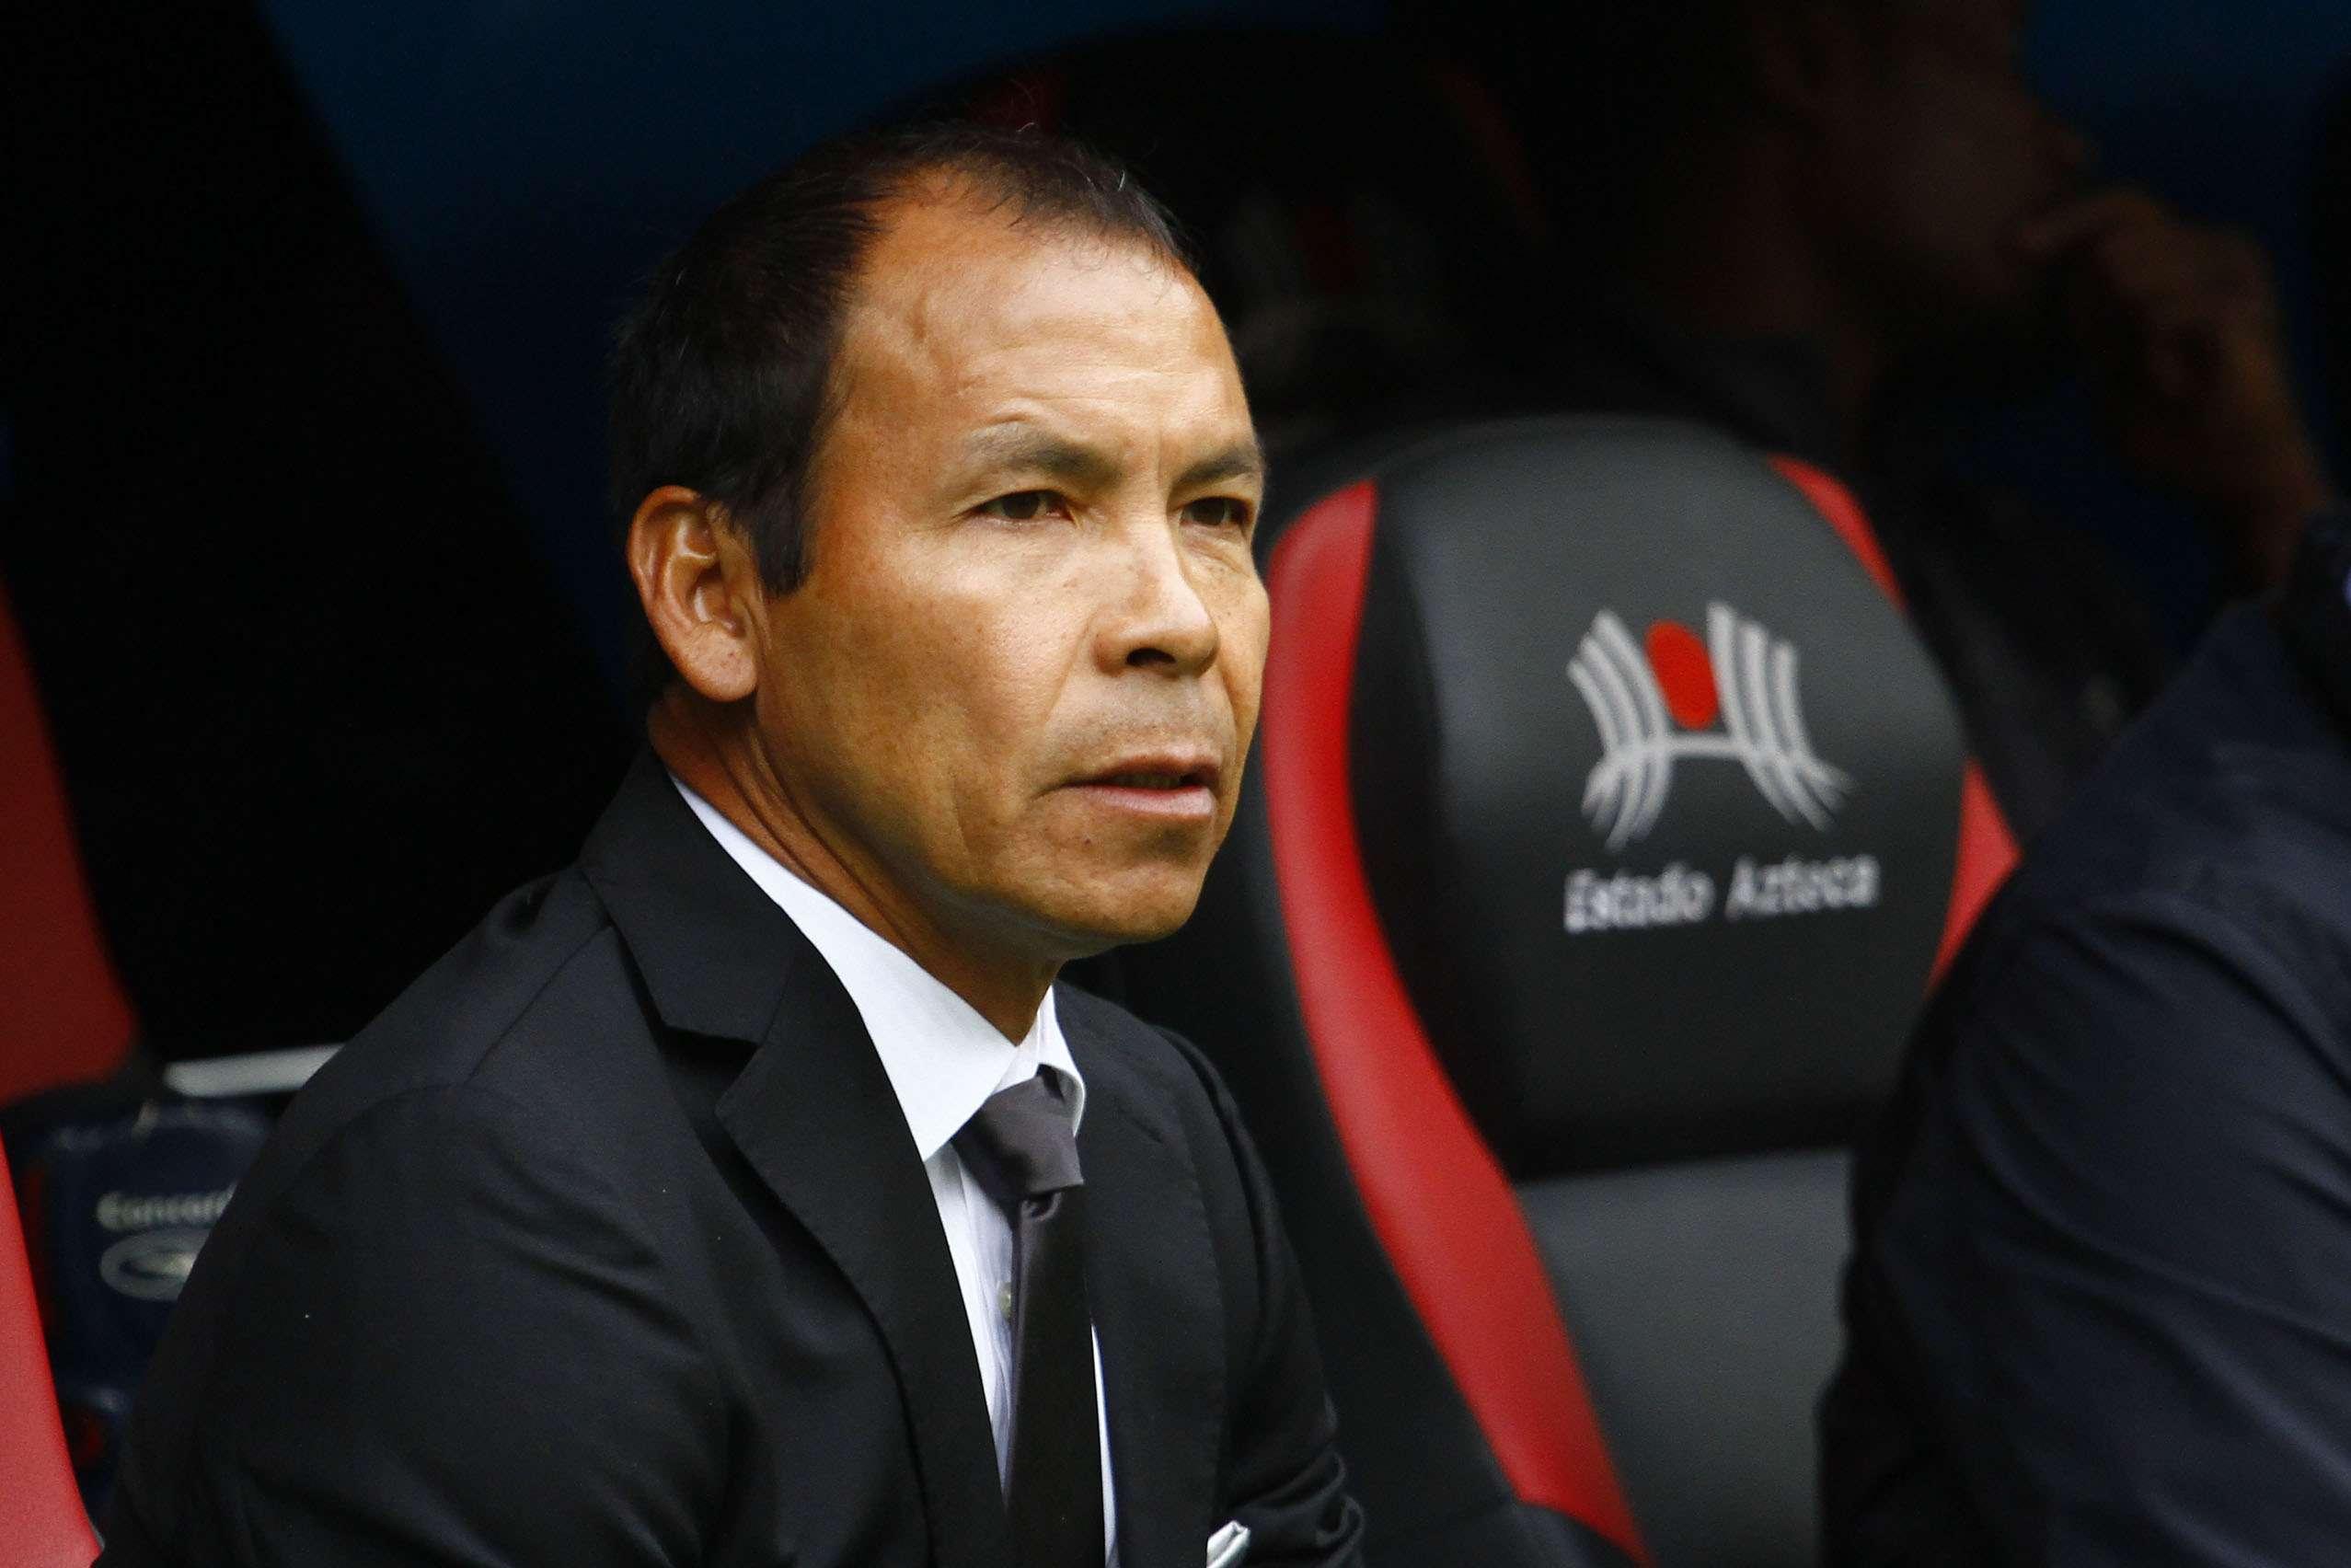 El 'Profe' Cruz, técnico del Puebla. Foto: Imago7